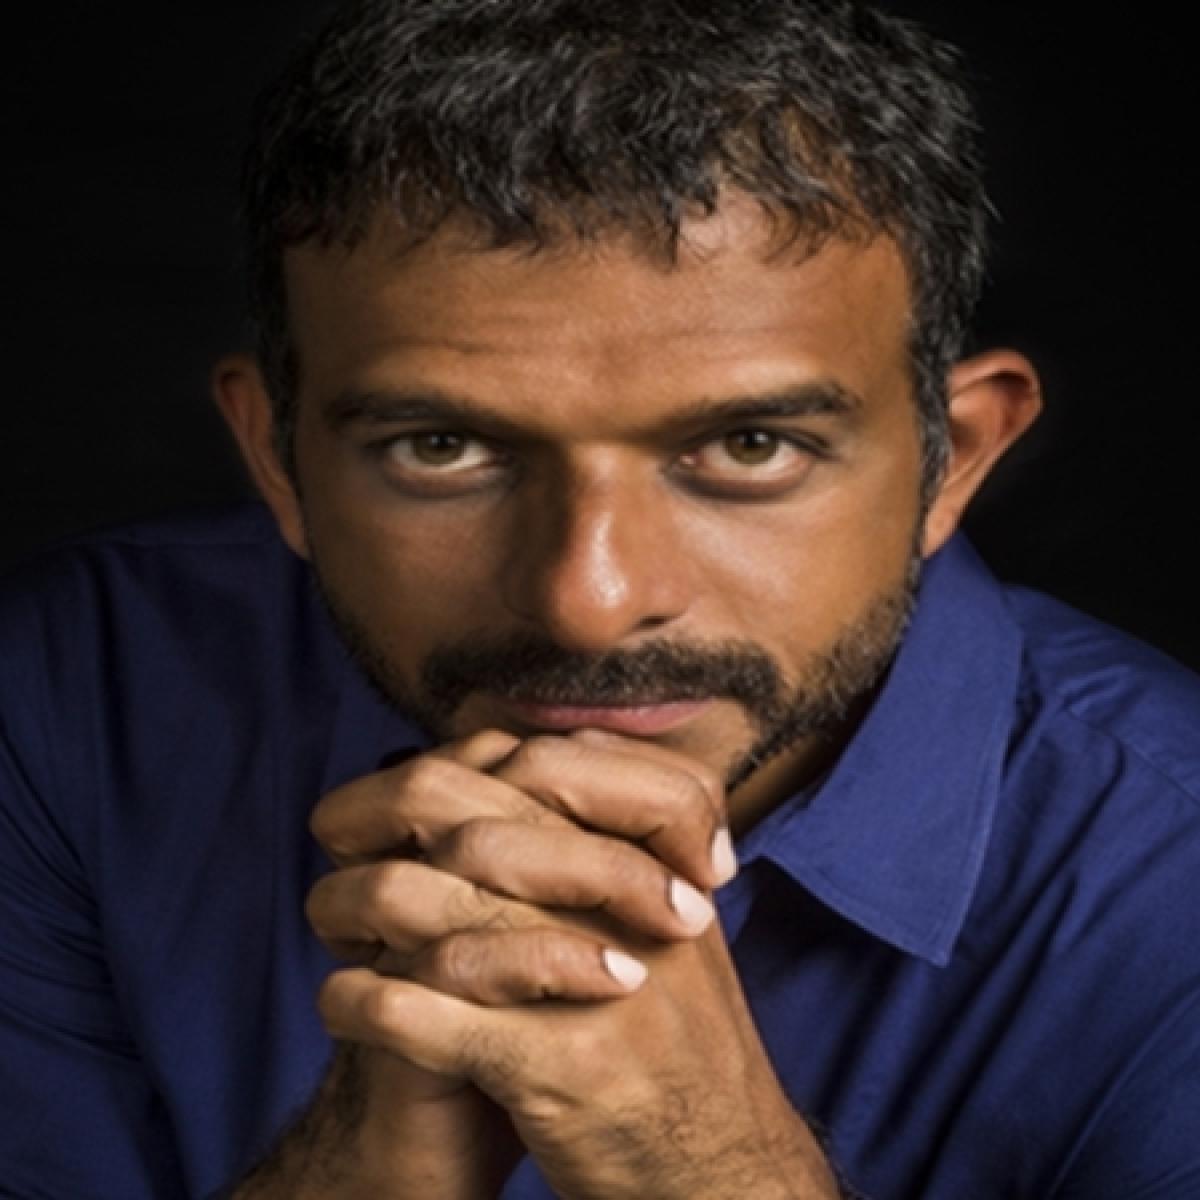 Constant reflection on my privilege prevents 'helper's high': TM Krishna